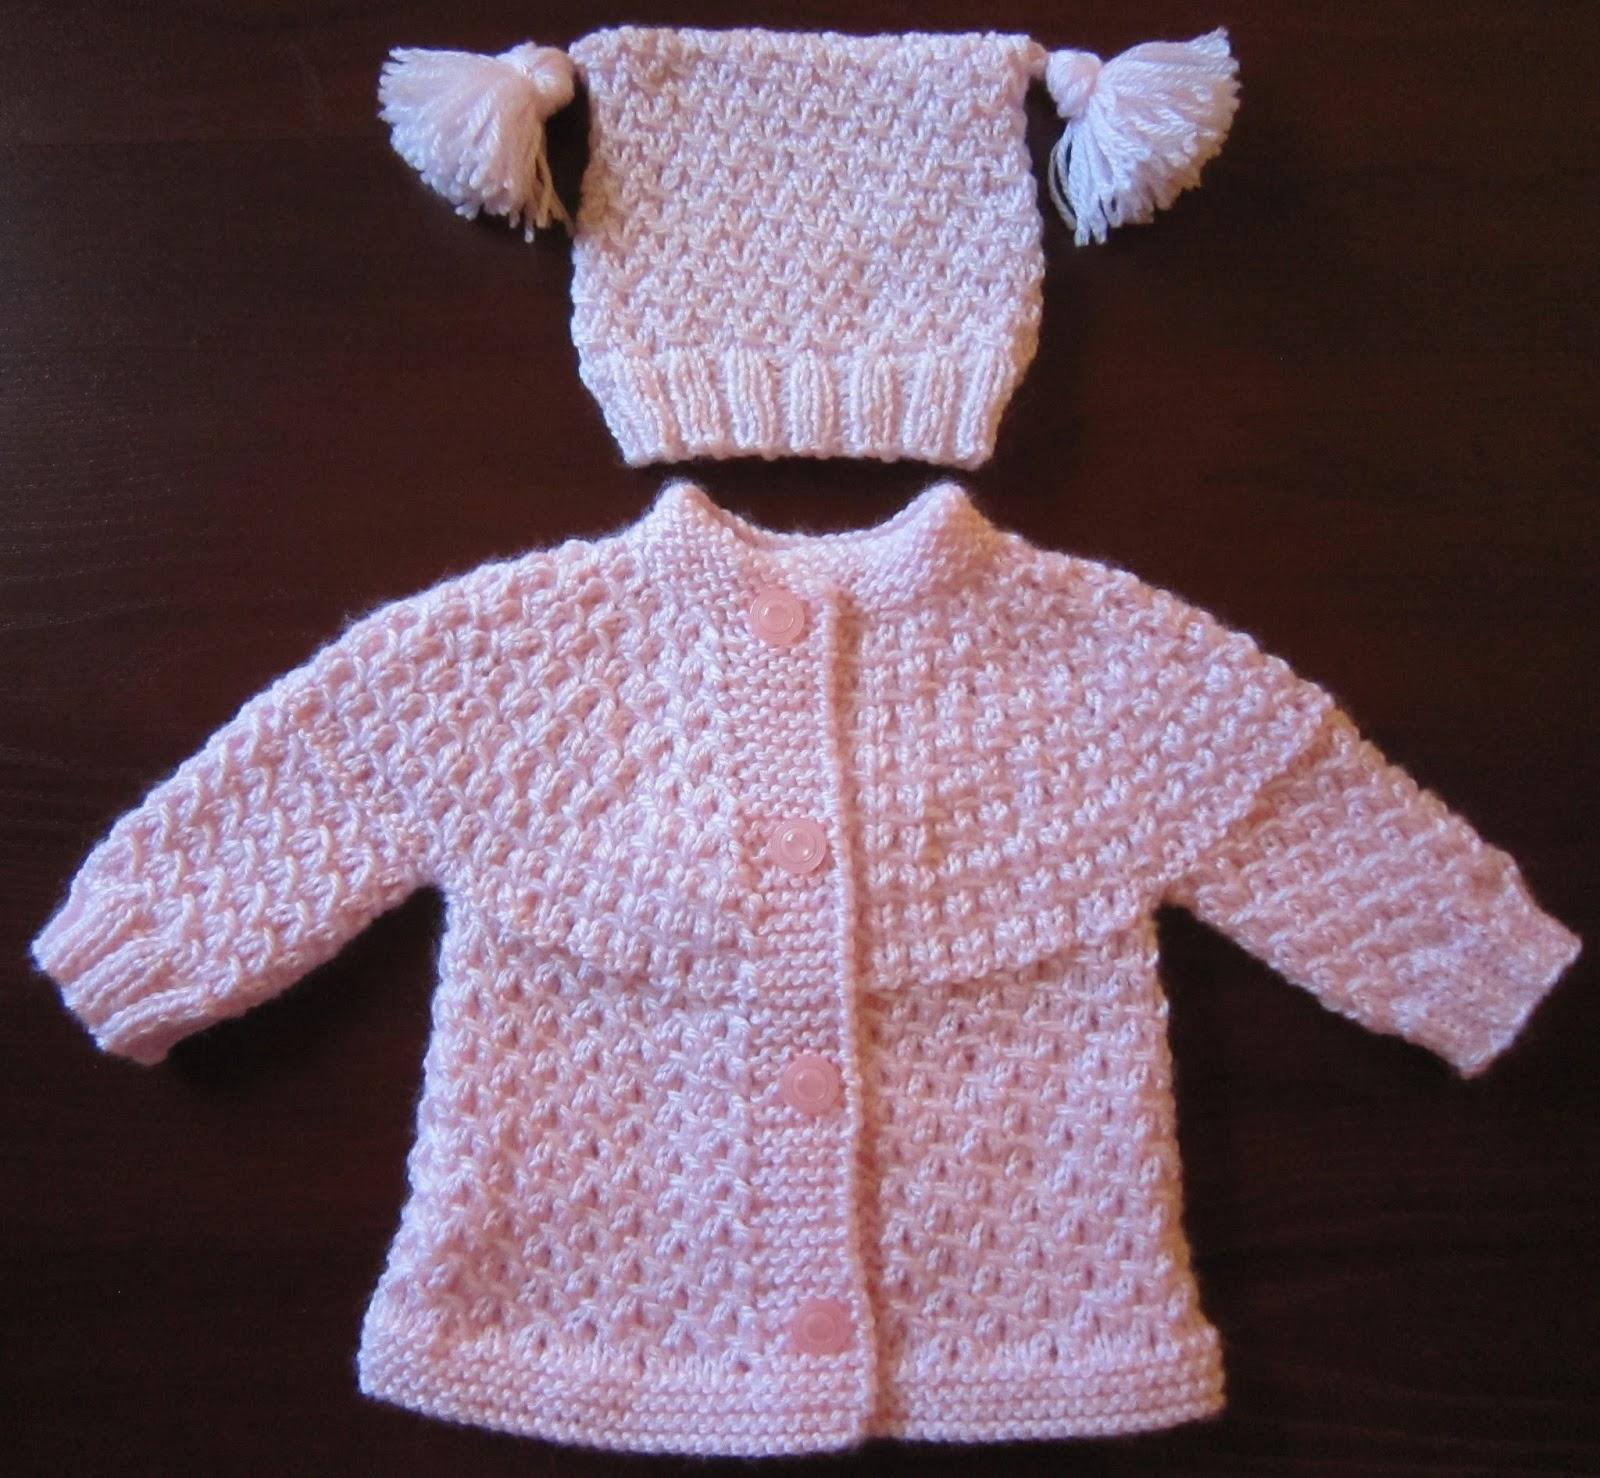 Sea Trail Grandmas Free Preemie Knit Sweater And Hat